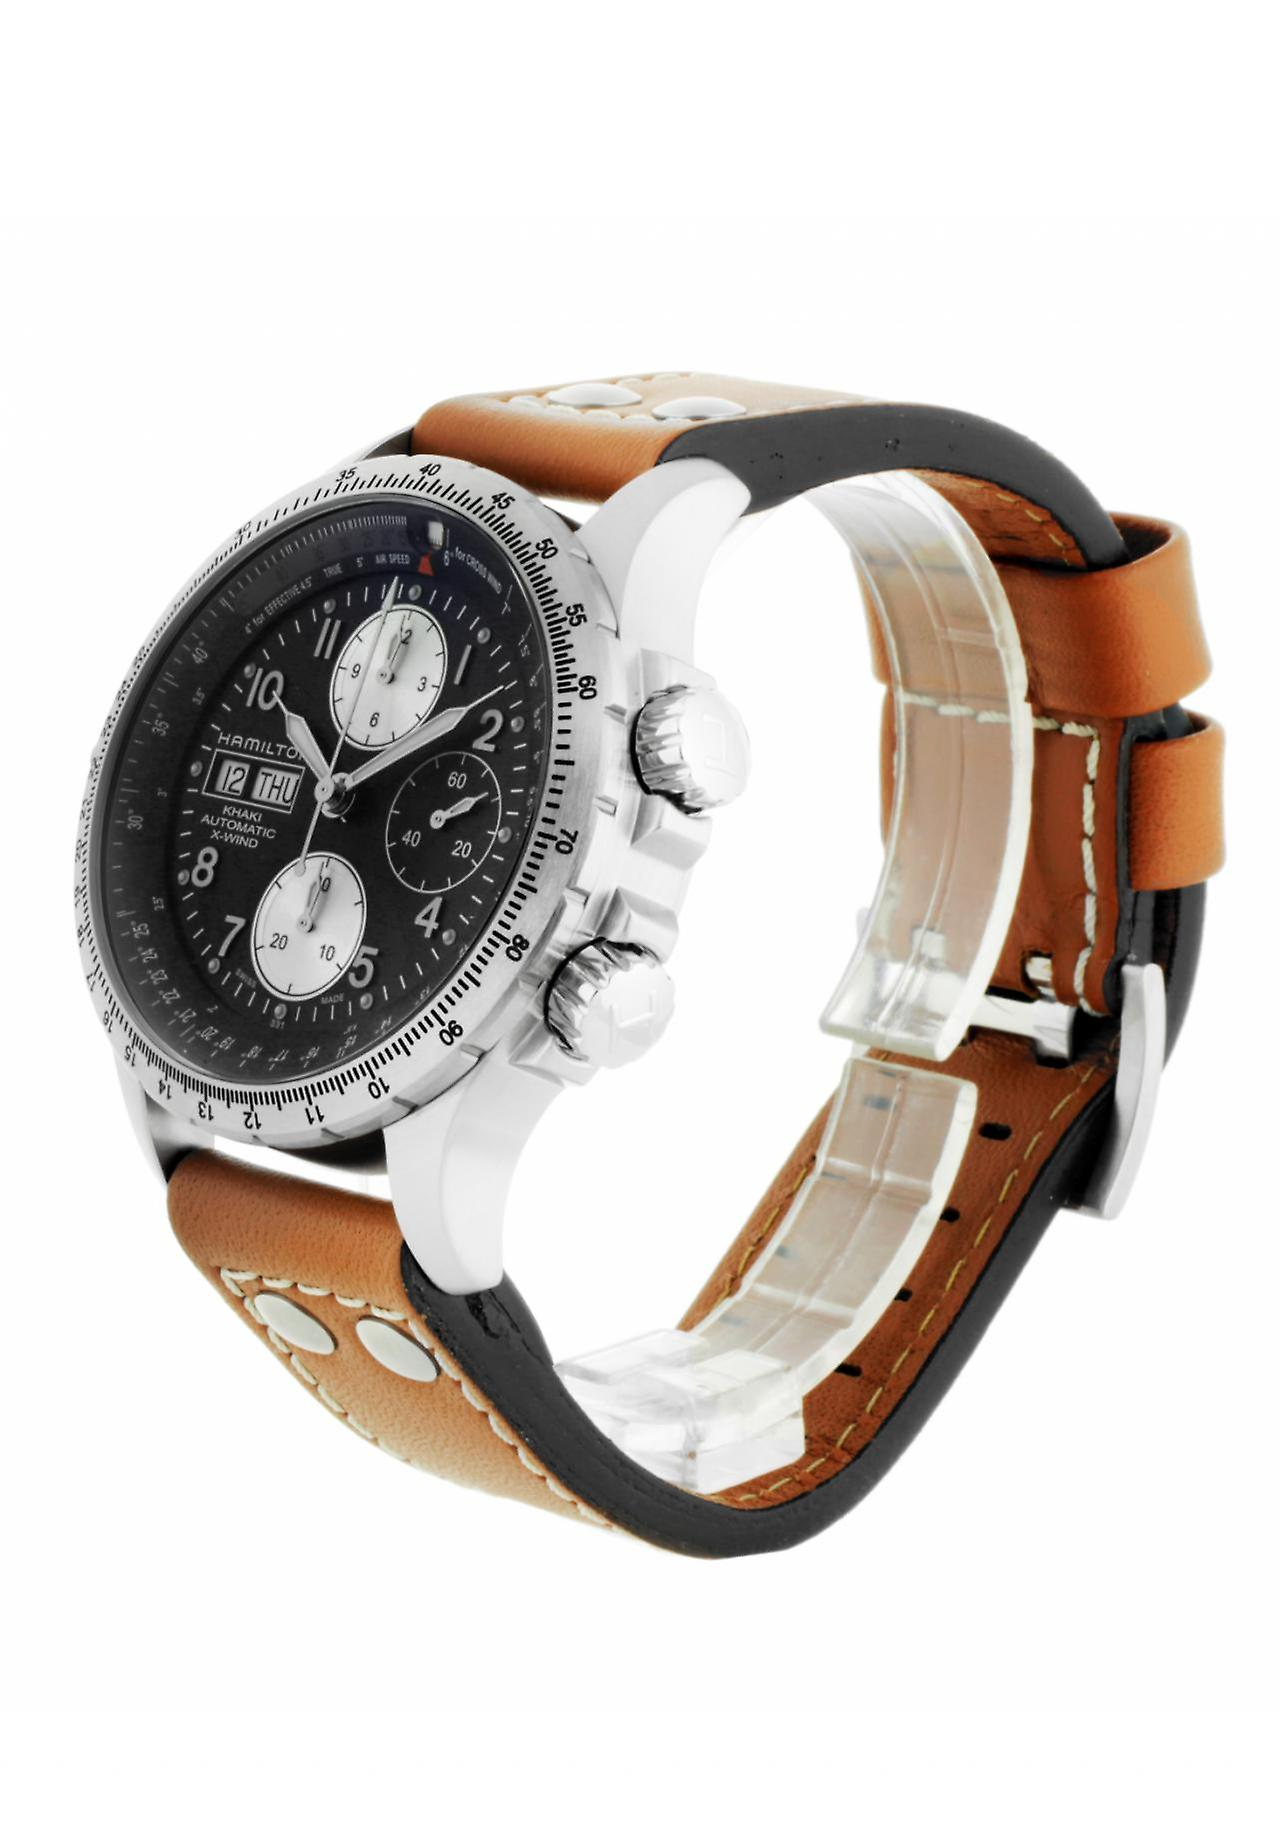 Hamilton Khaki X-WIND Automatikchronograph (H77616533)